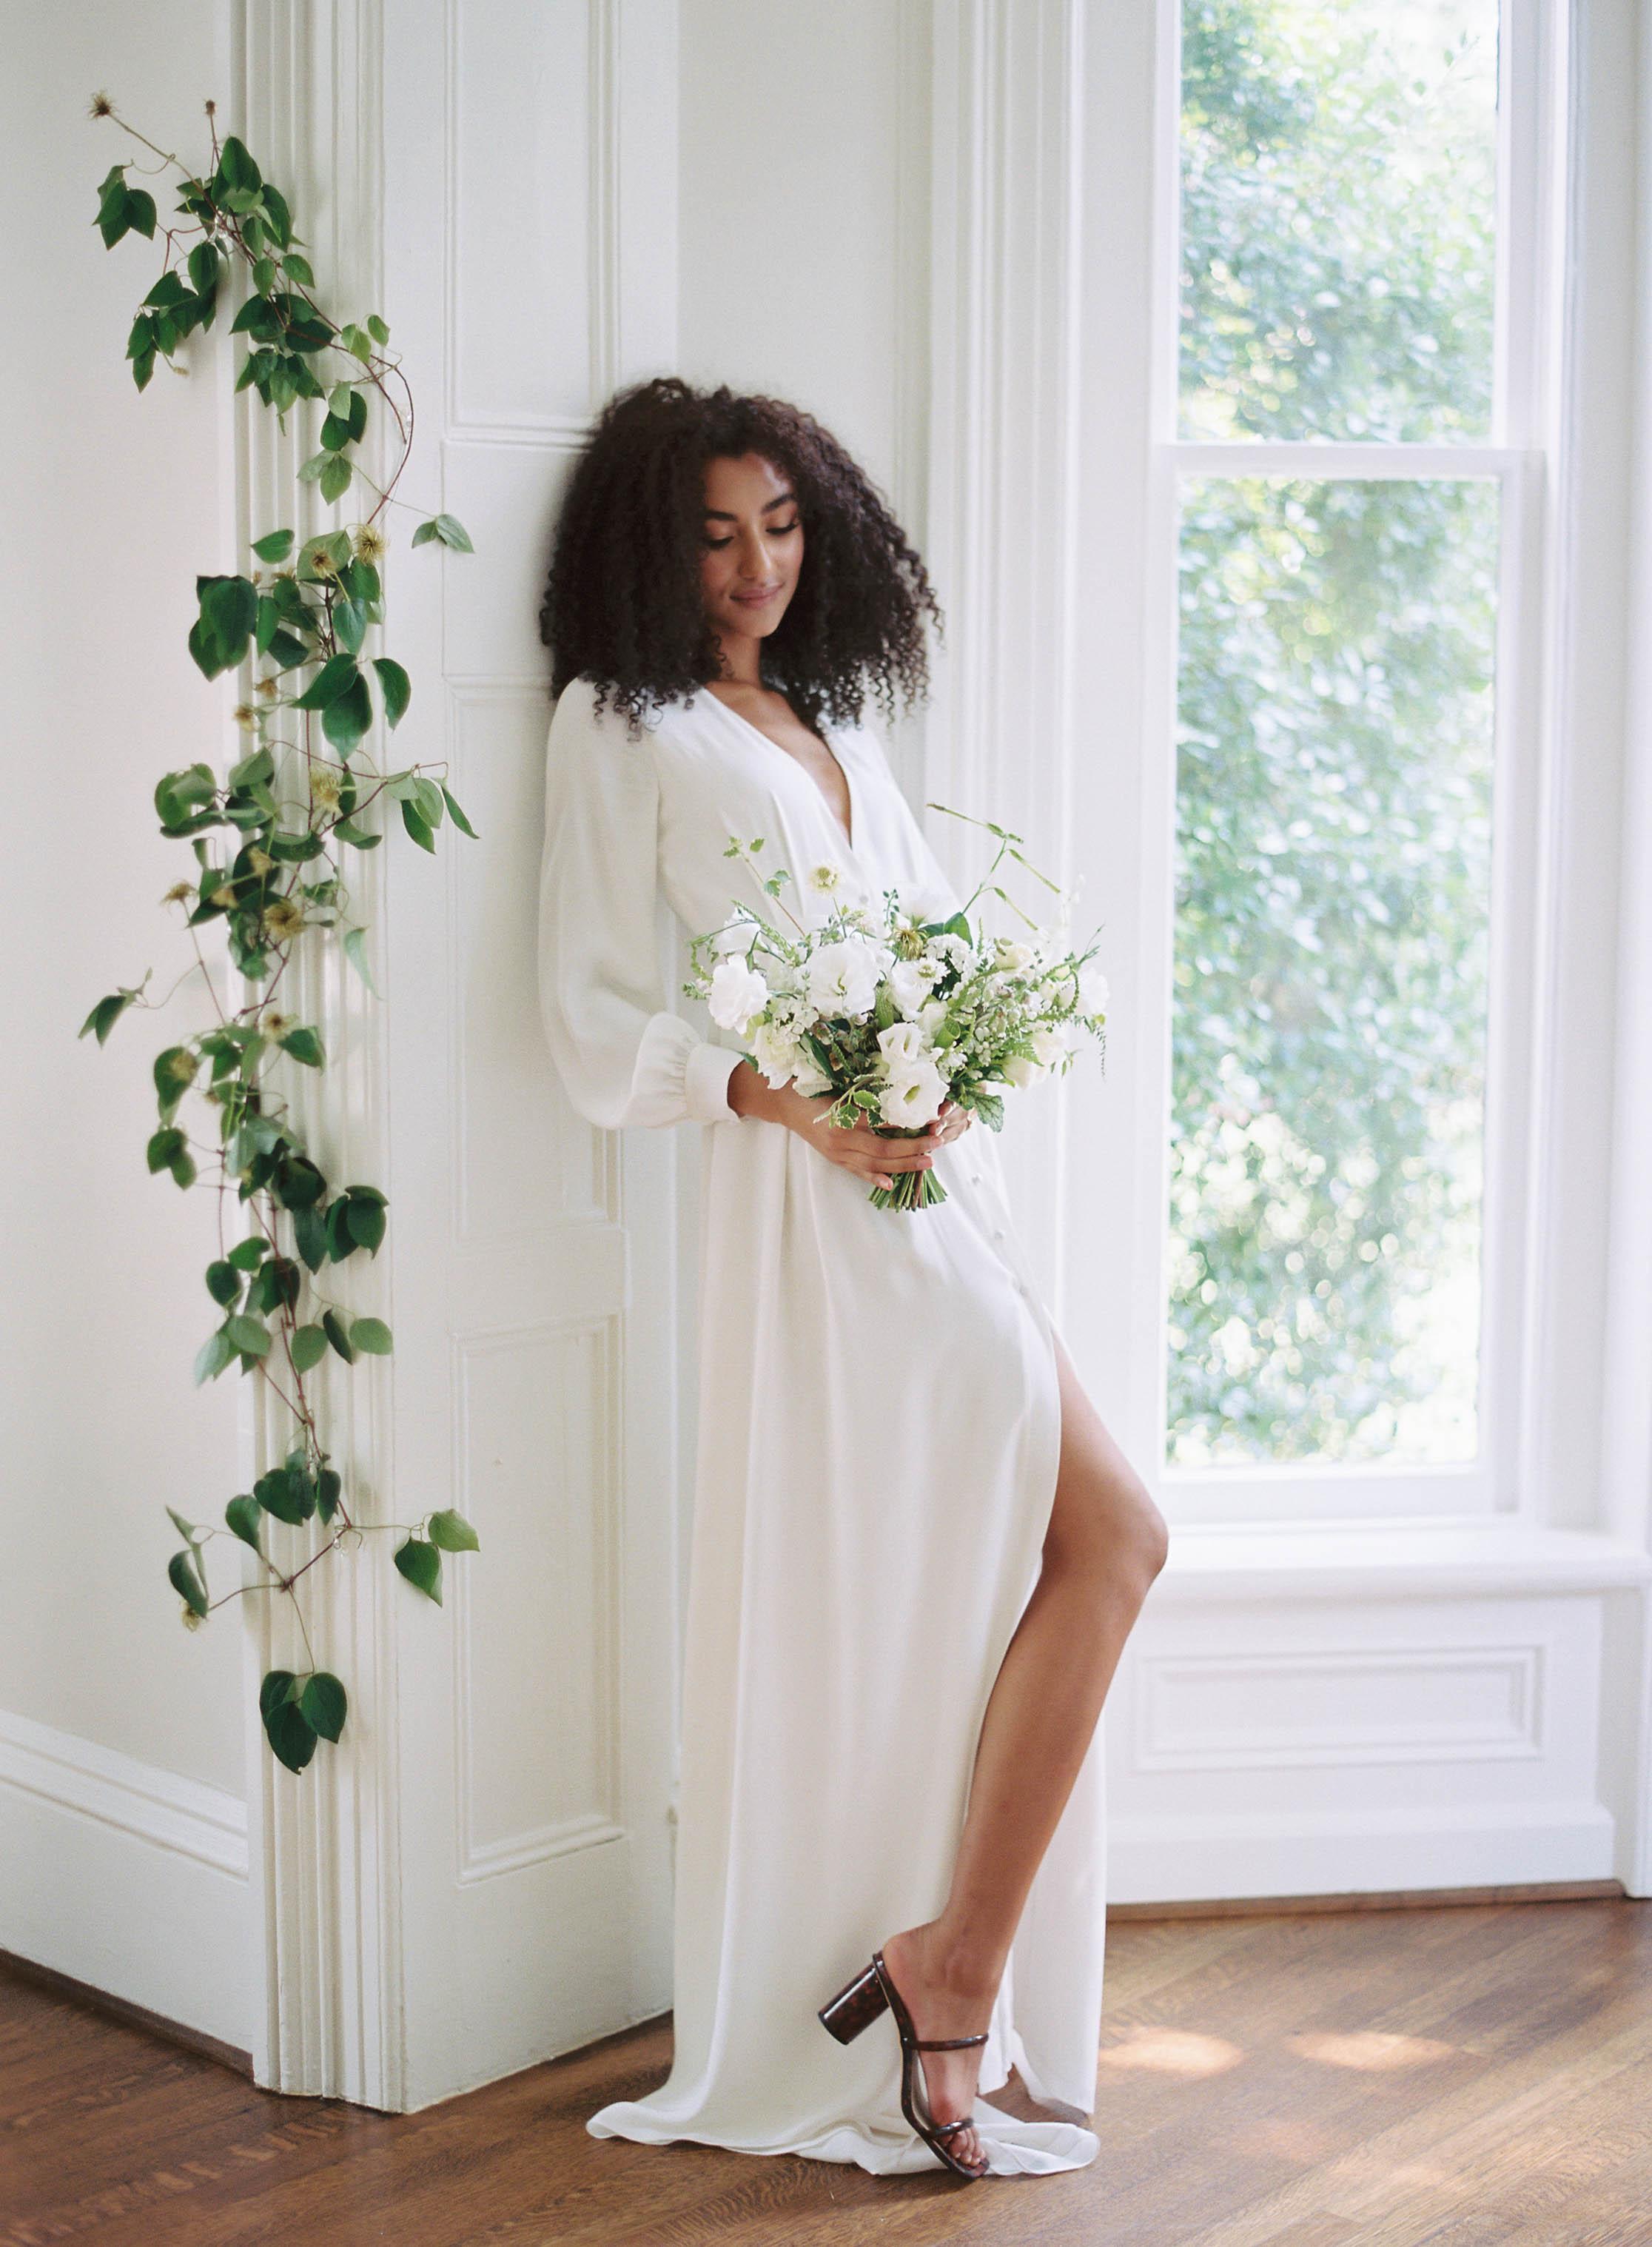 Bride in elegant white long-sleeved gown